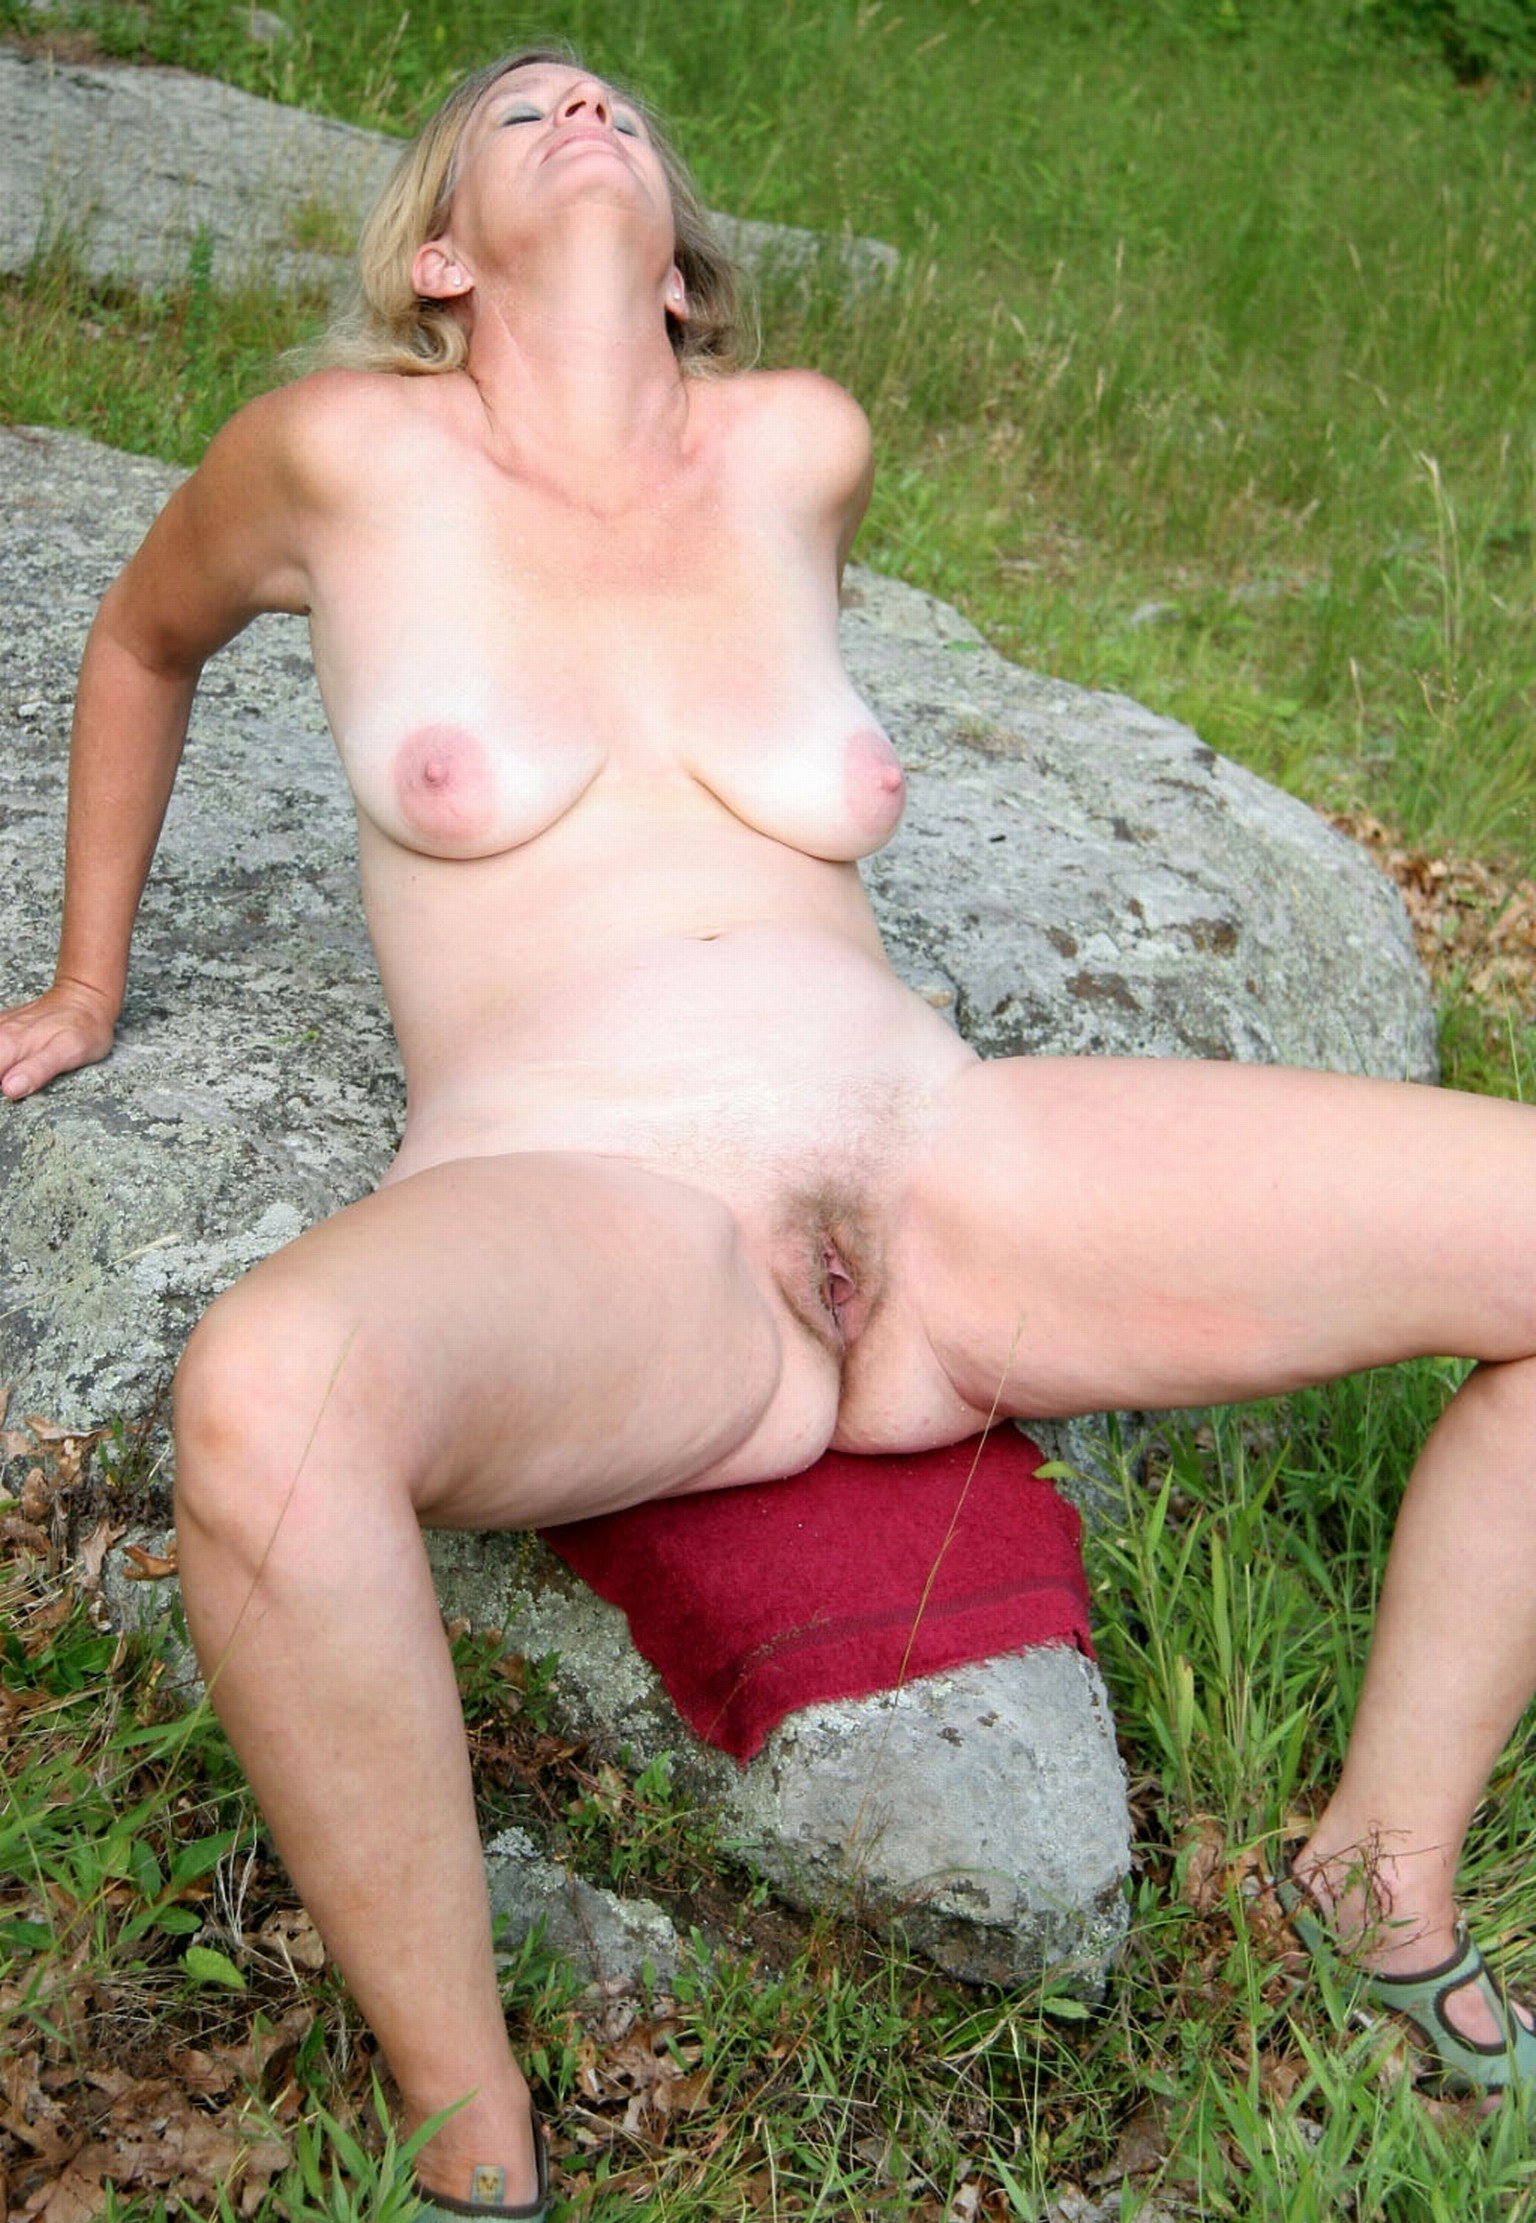 male porn star photo